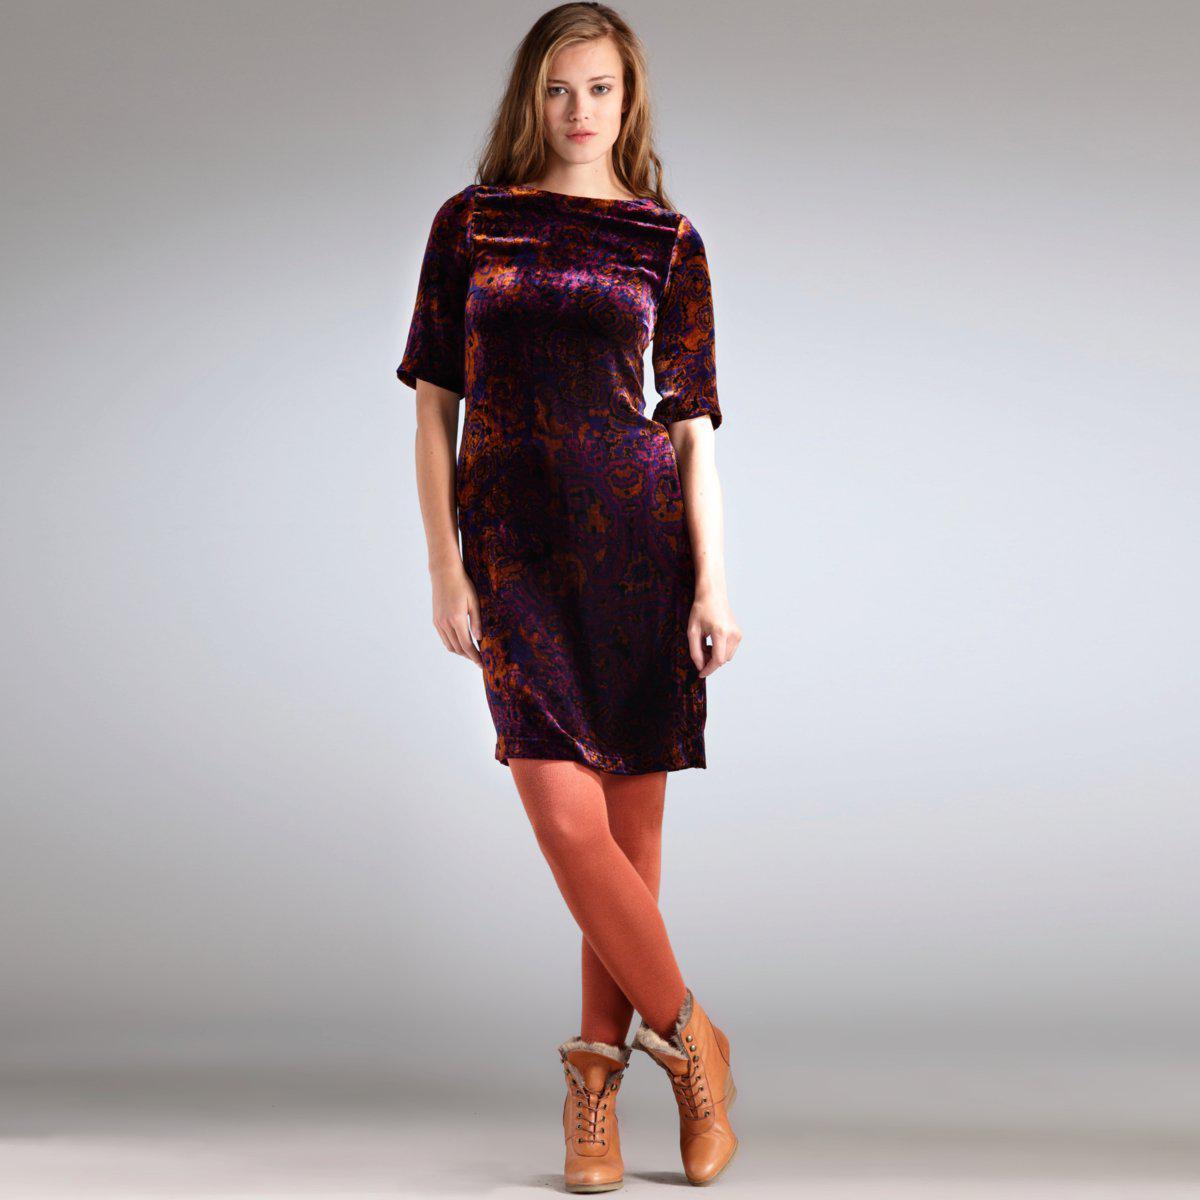 bradyna foremata 258 - Βραδυνα Φορεματα LaRedoute Φθινόπωρο 2011 Κωδ. 324209754